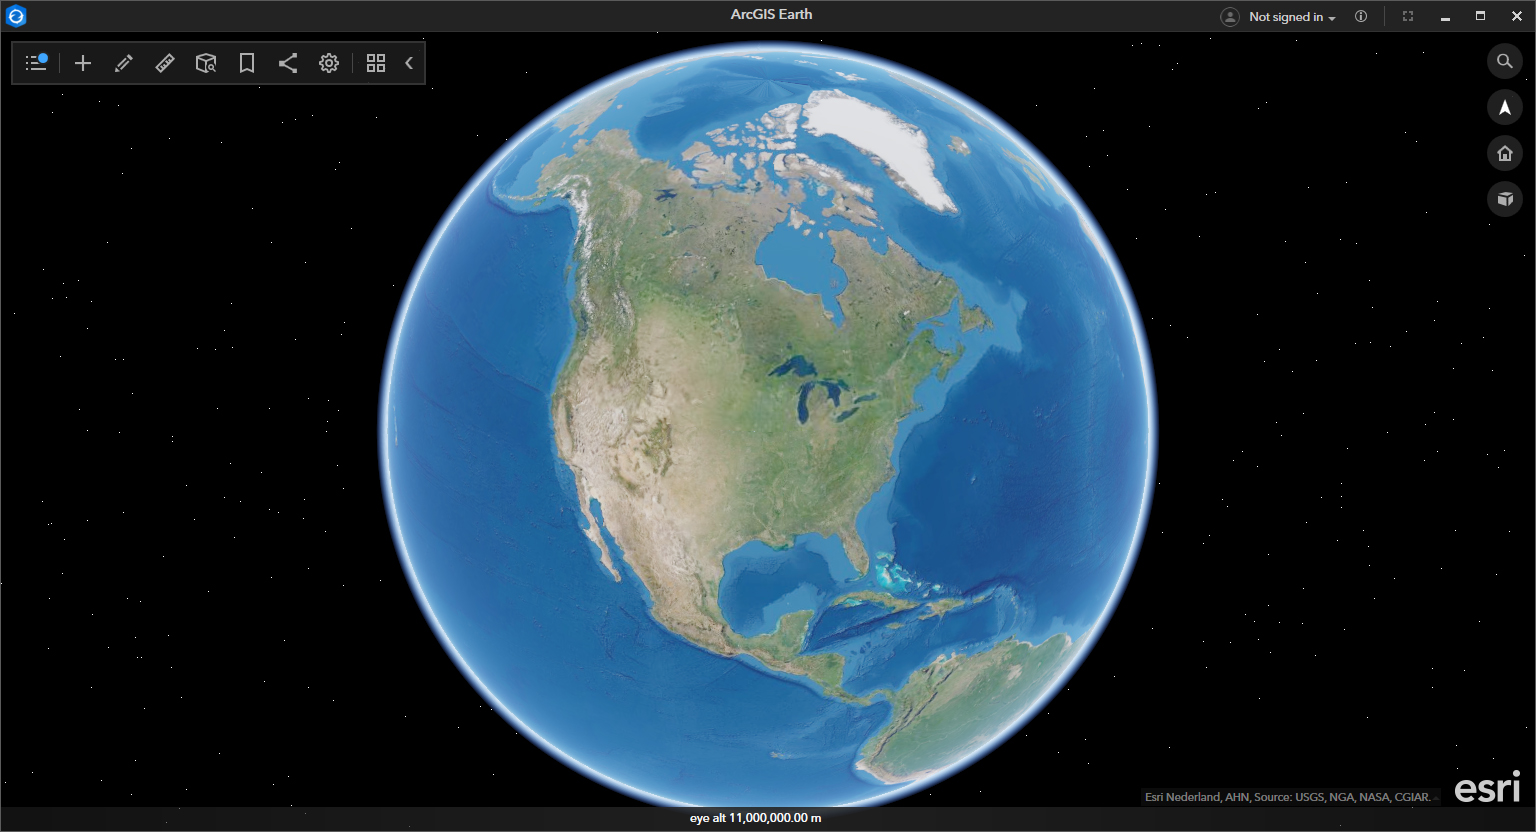 16ArcGIS Earth.jpg